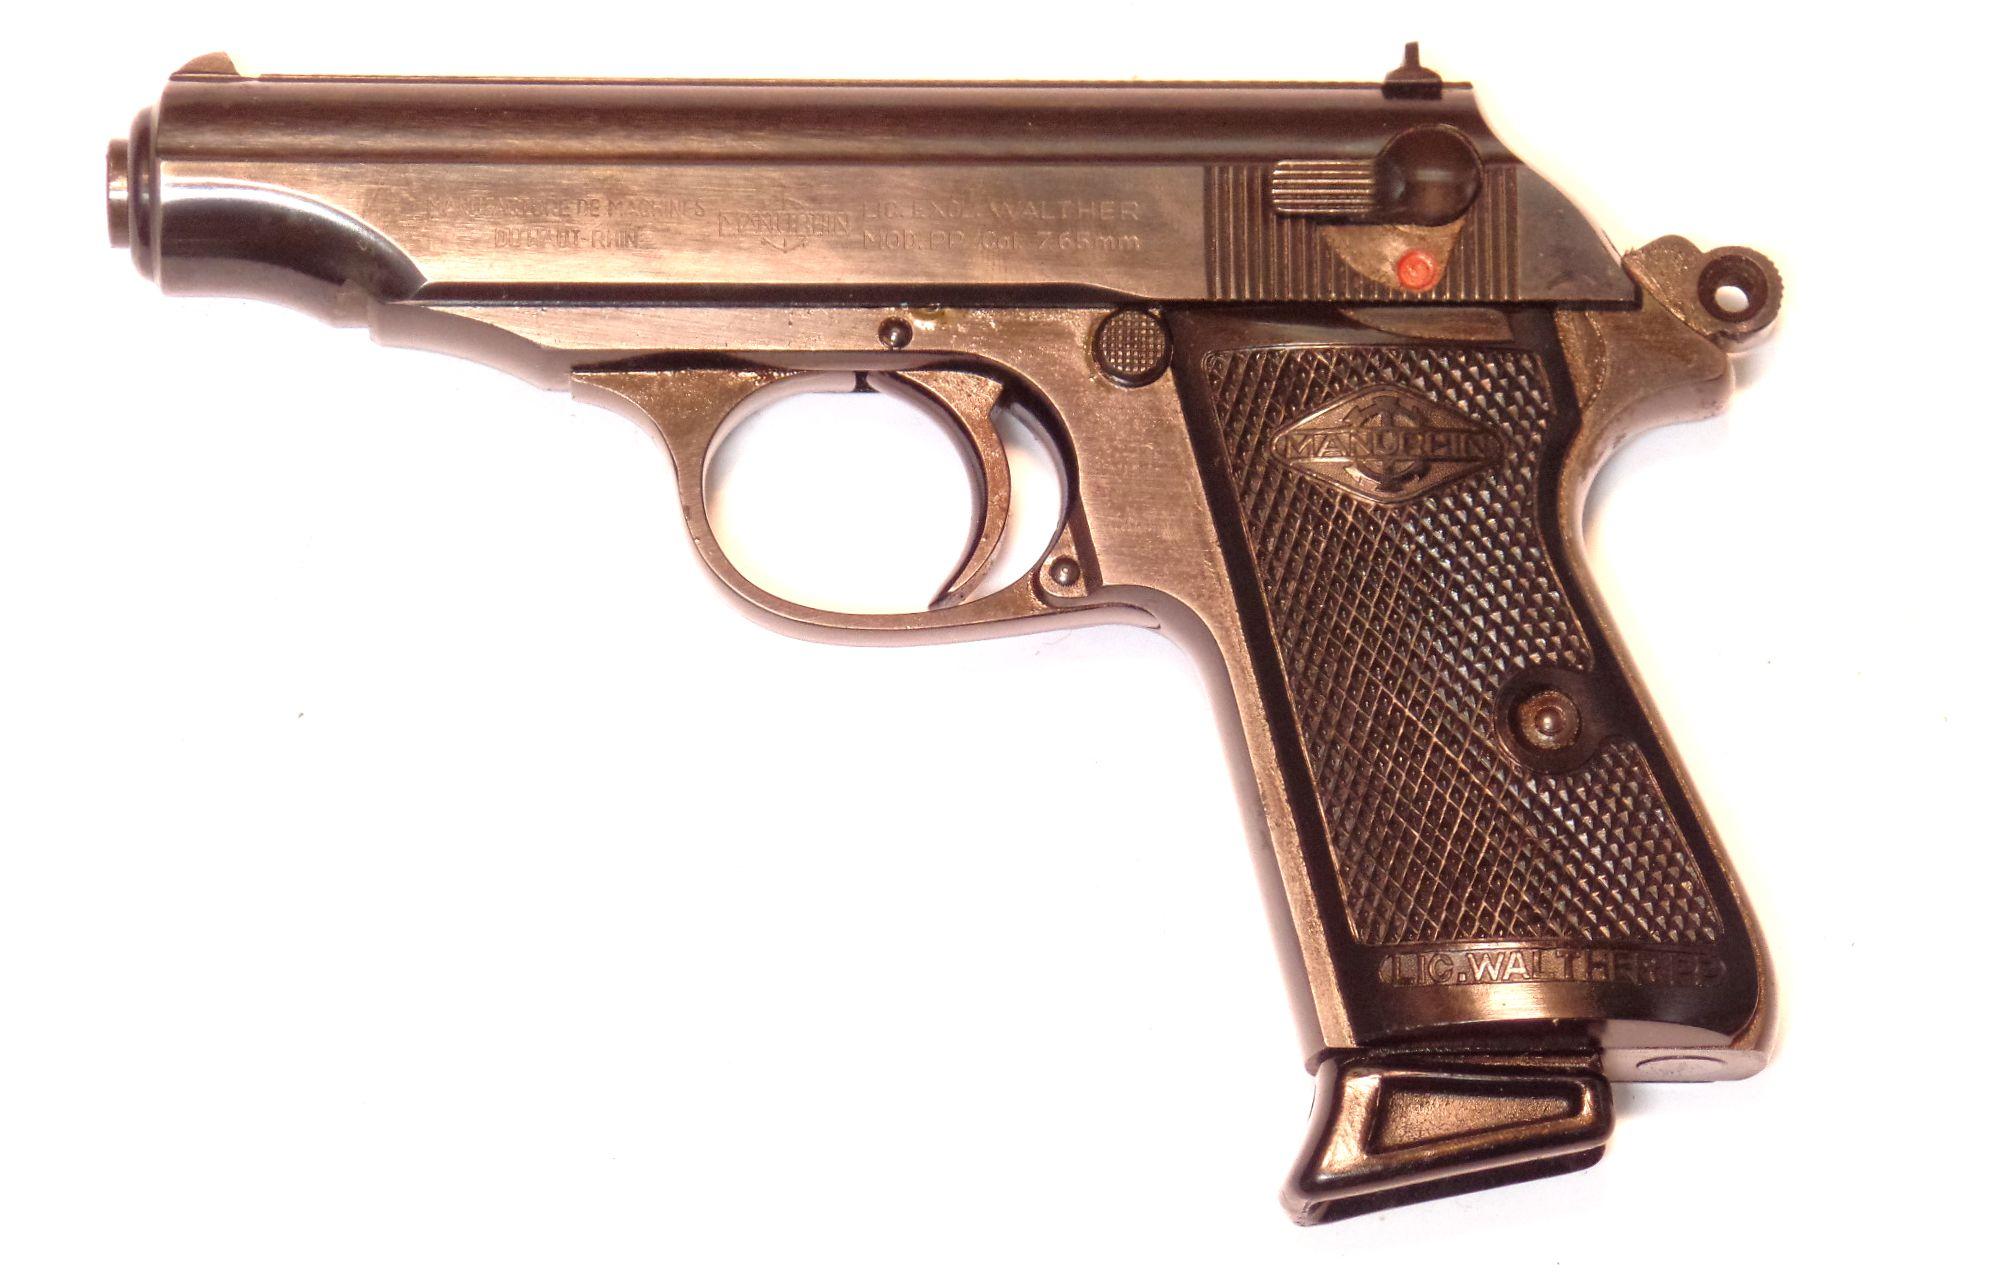 WALTHER MANURHIN PP calibre 7.65 Browning